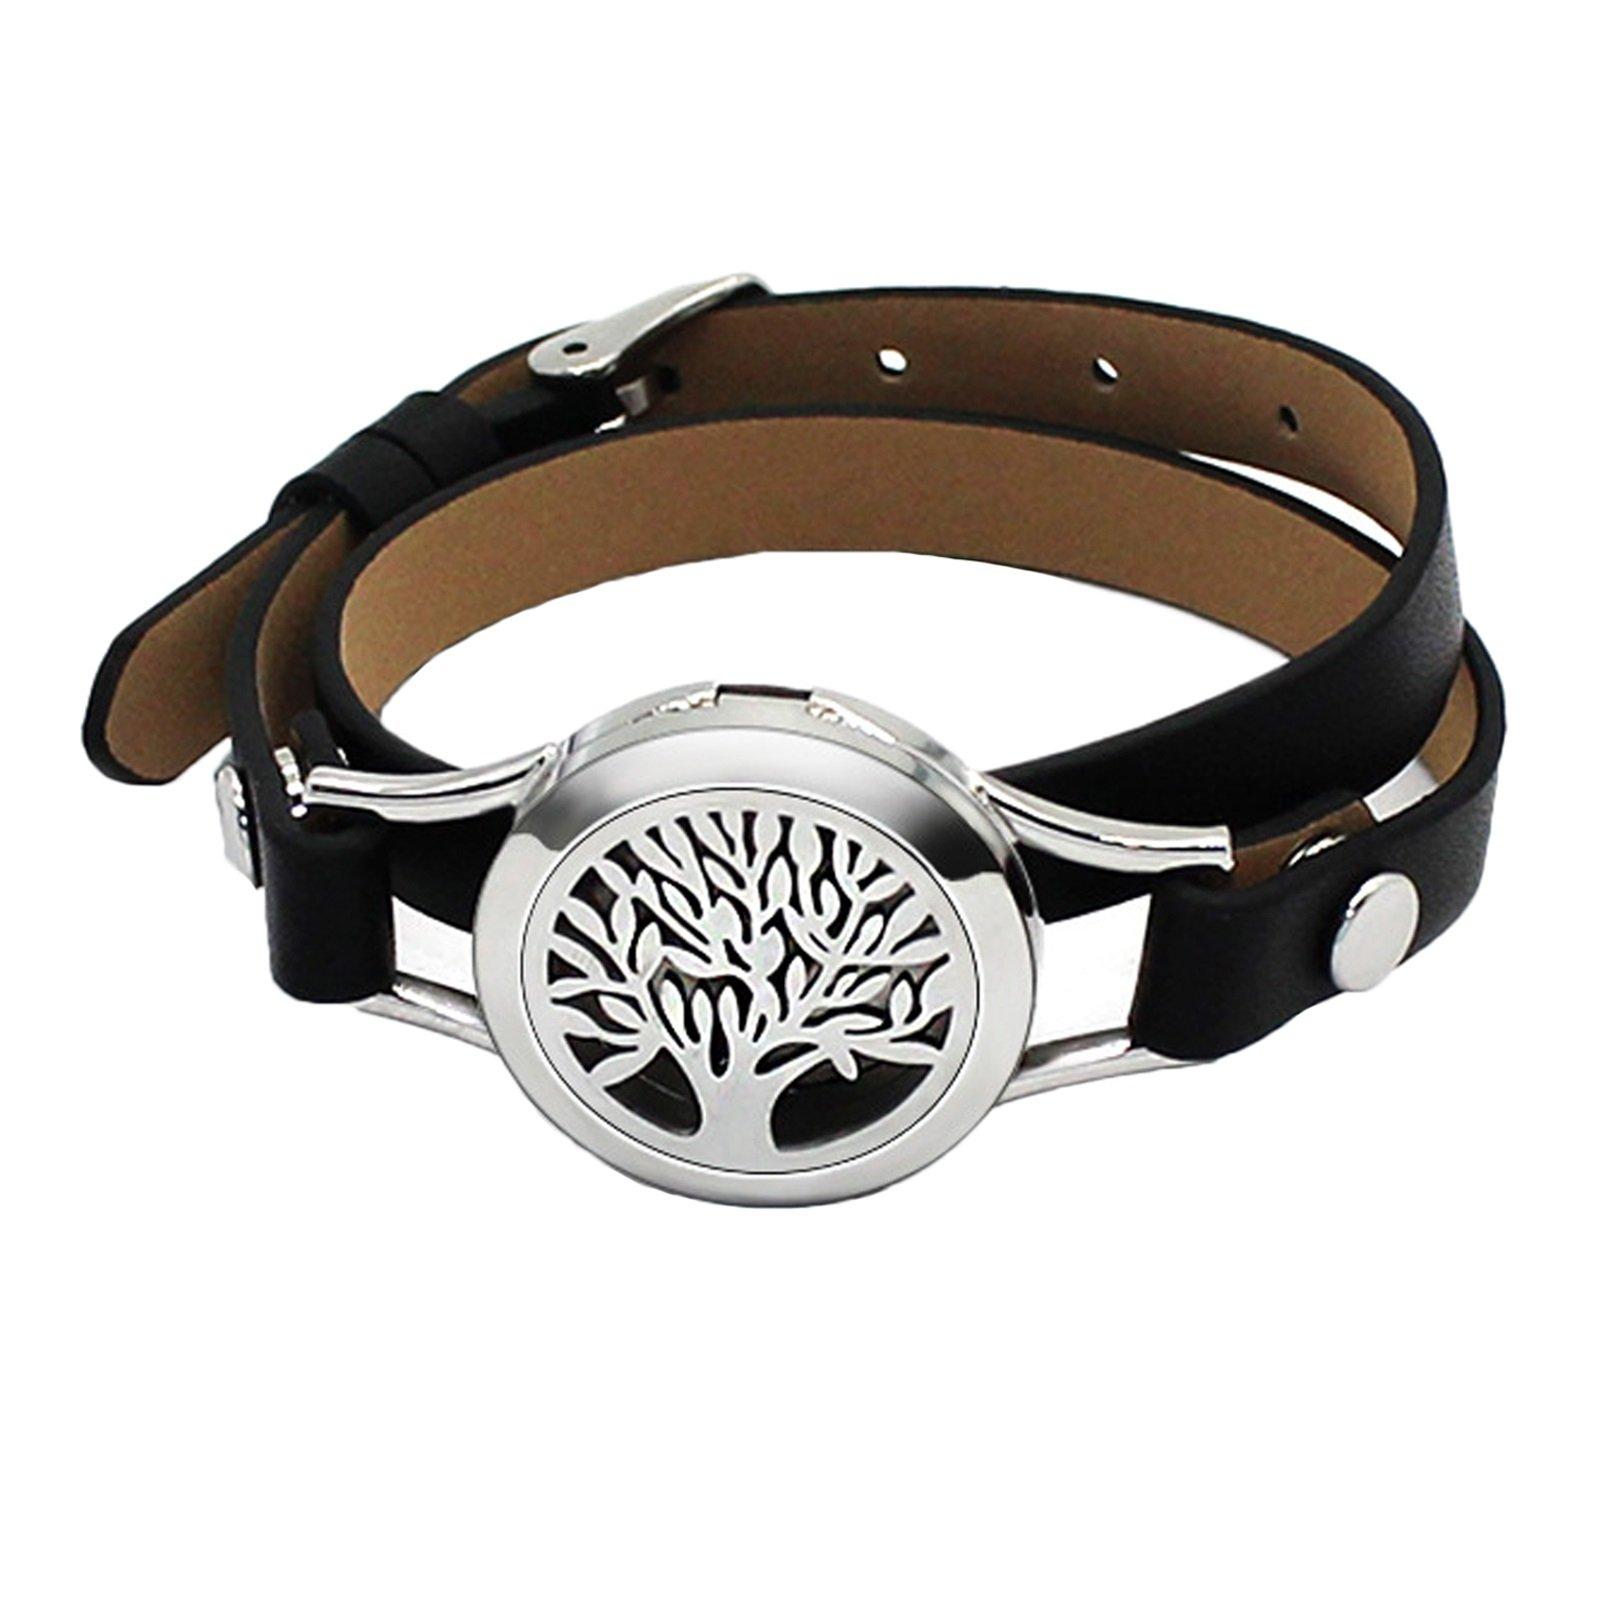 Aienid Diffuser Bracelet Tree of Life Adjustable Womens Bracelets Leather Black Aromatherapy Essential Oils